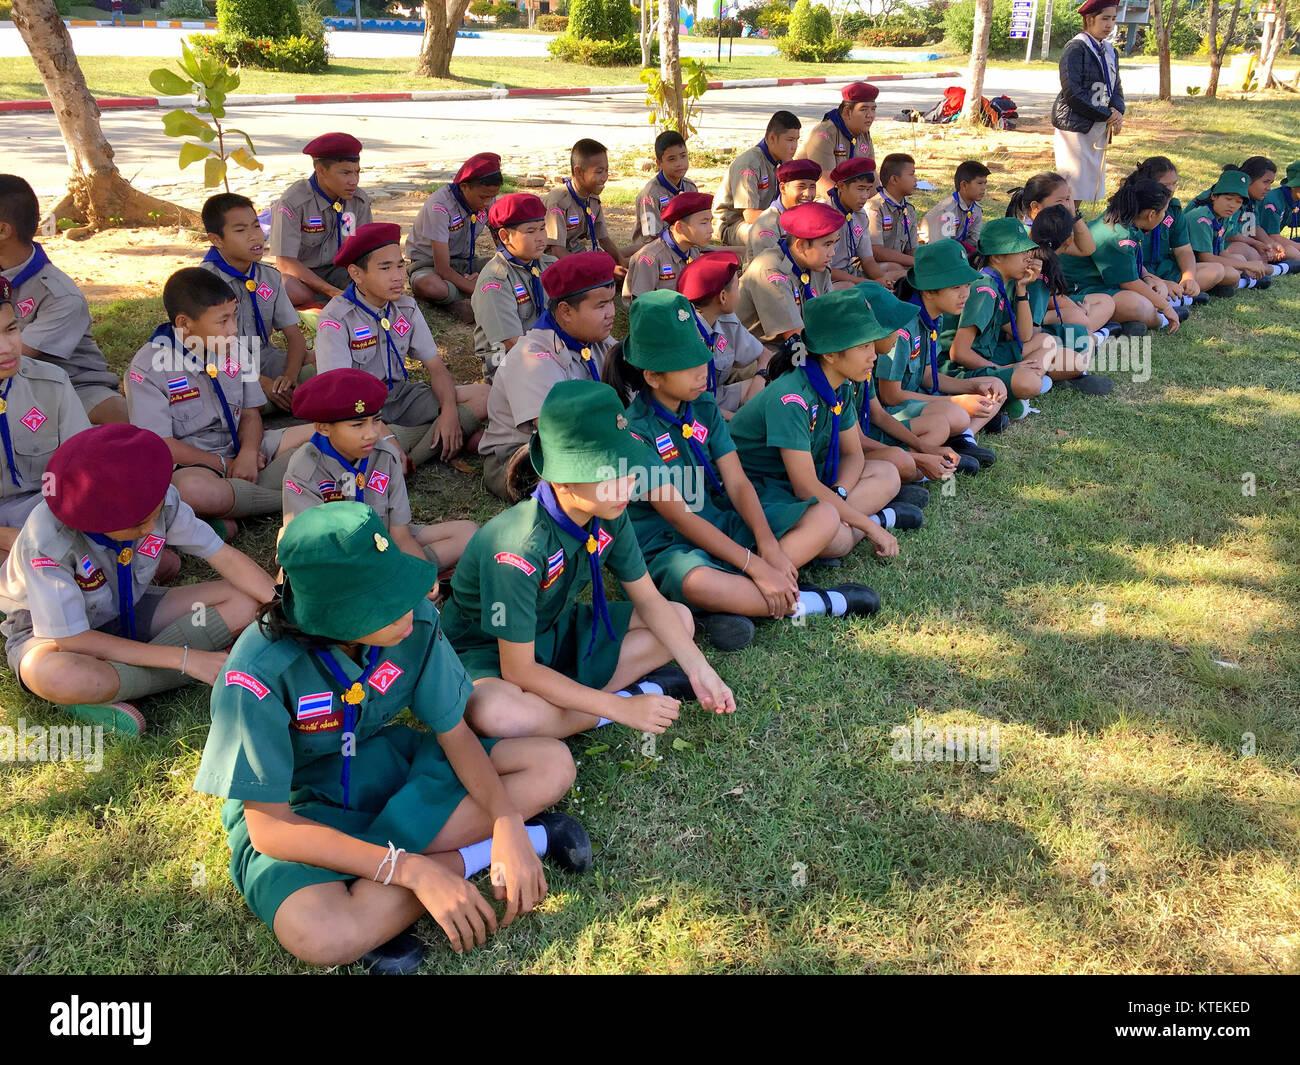 An Essay on Boy Scouts